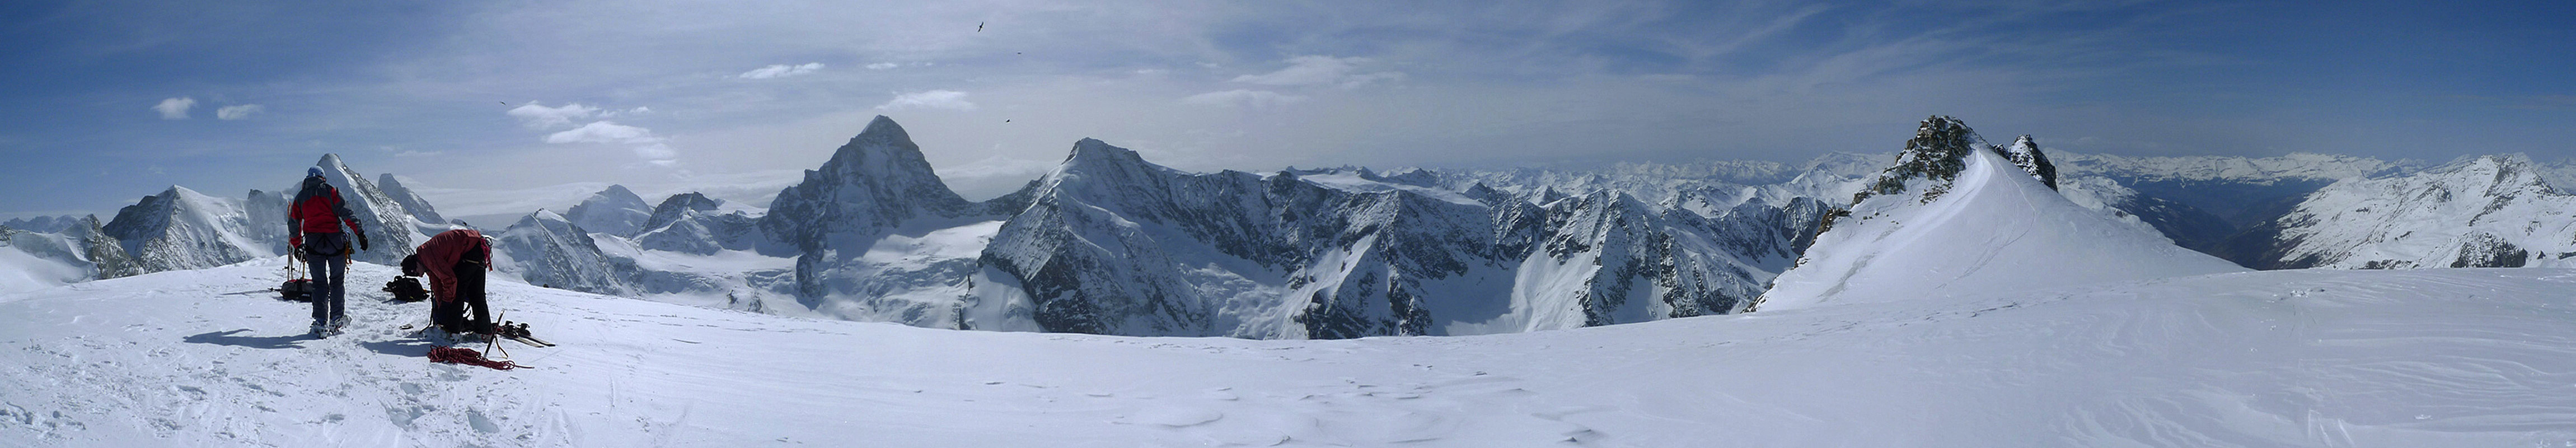 Mont Durand / Arbenhorn Walliser Alpen / Alpes valaisannes Switzerland panorama 41